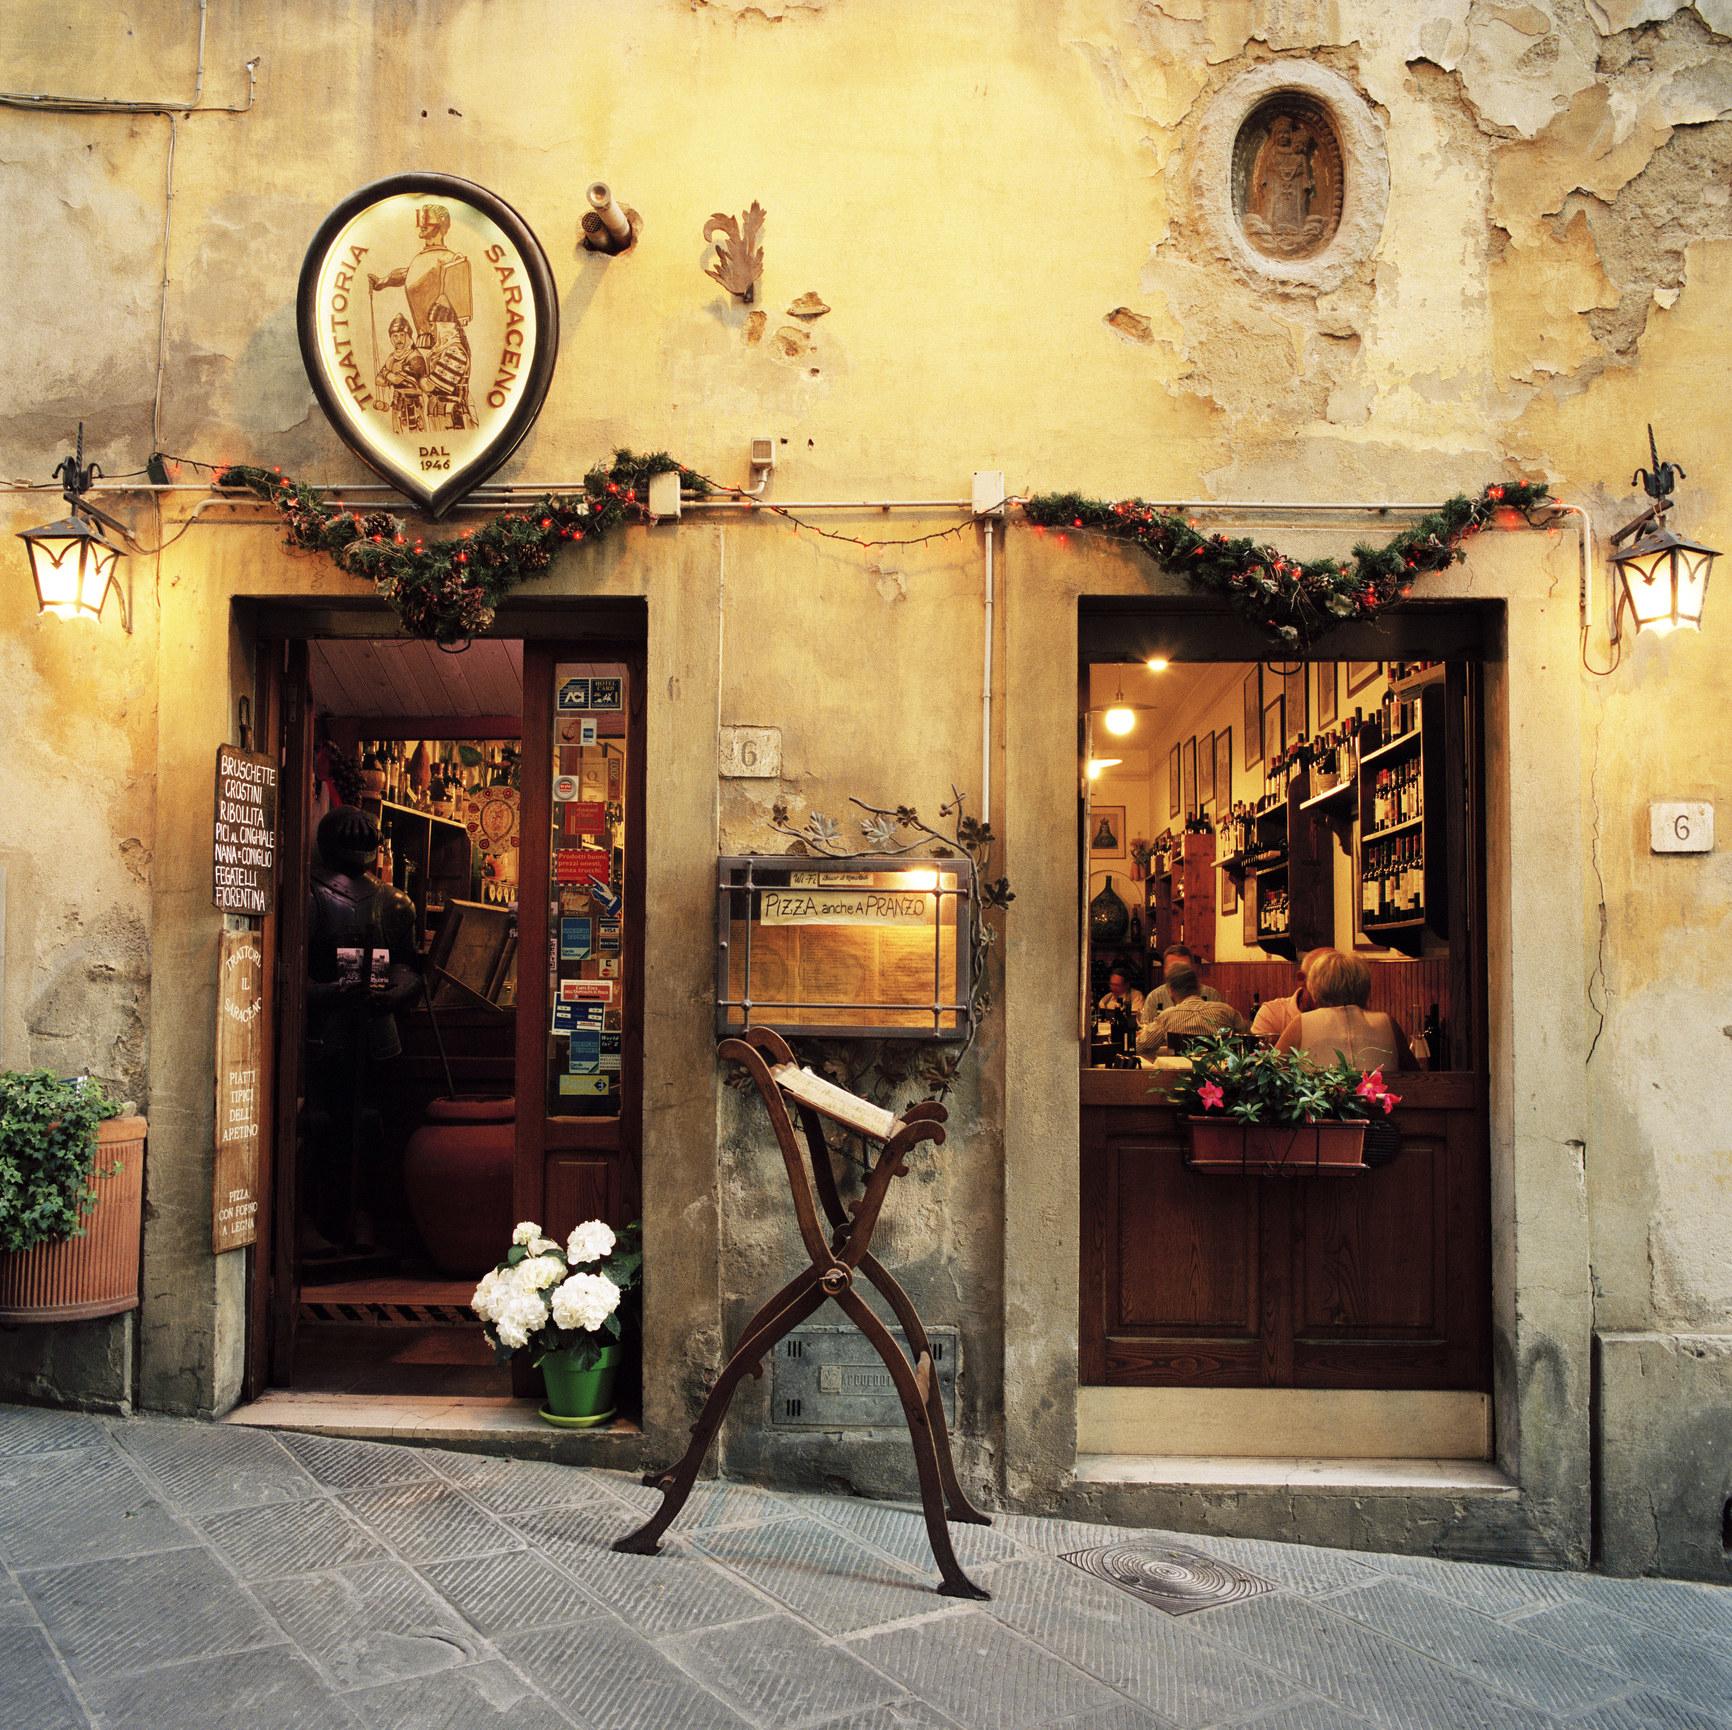 A quaint Italian restaurant.